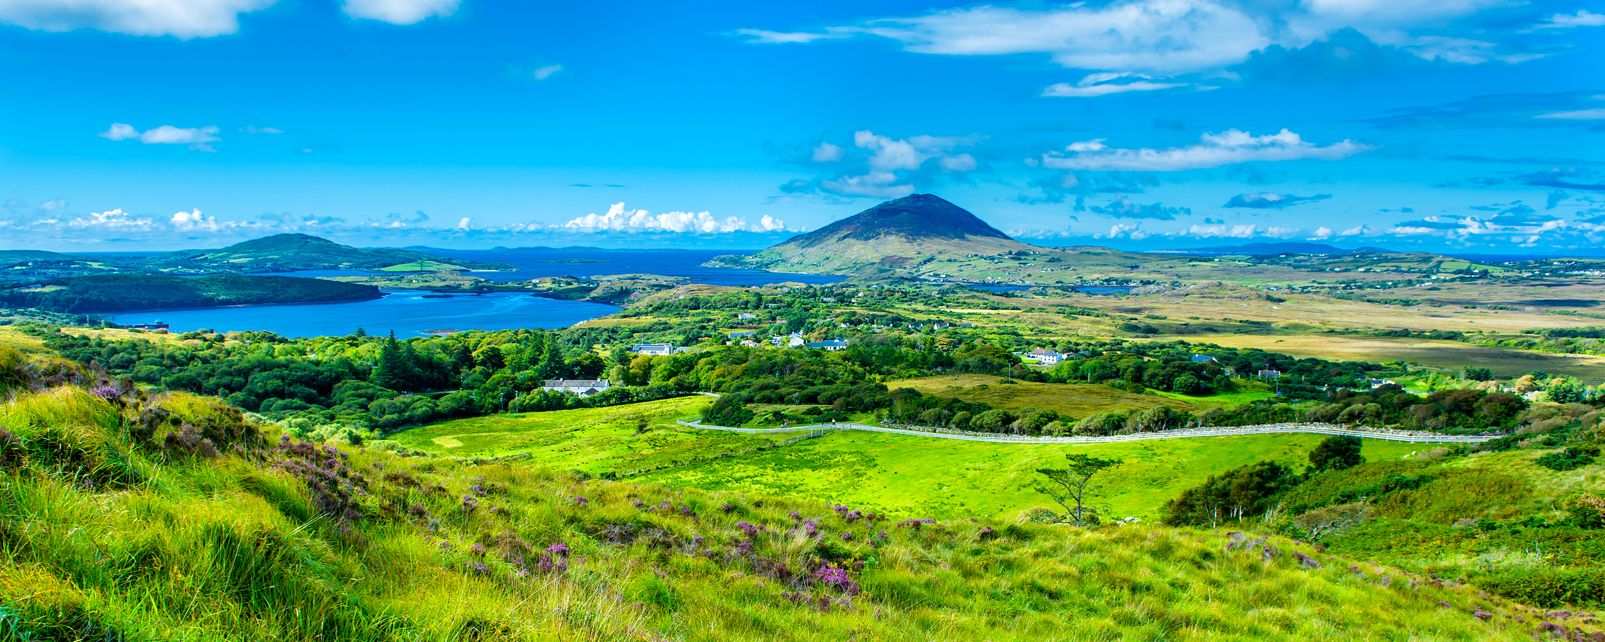 The rivers of Connemara, Connemara, Landscapes, Galway, Ireland